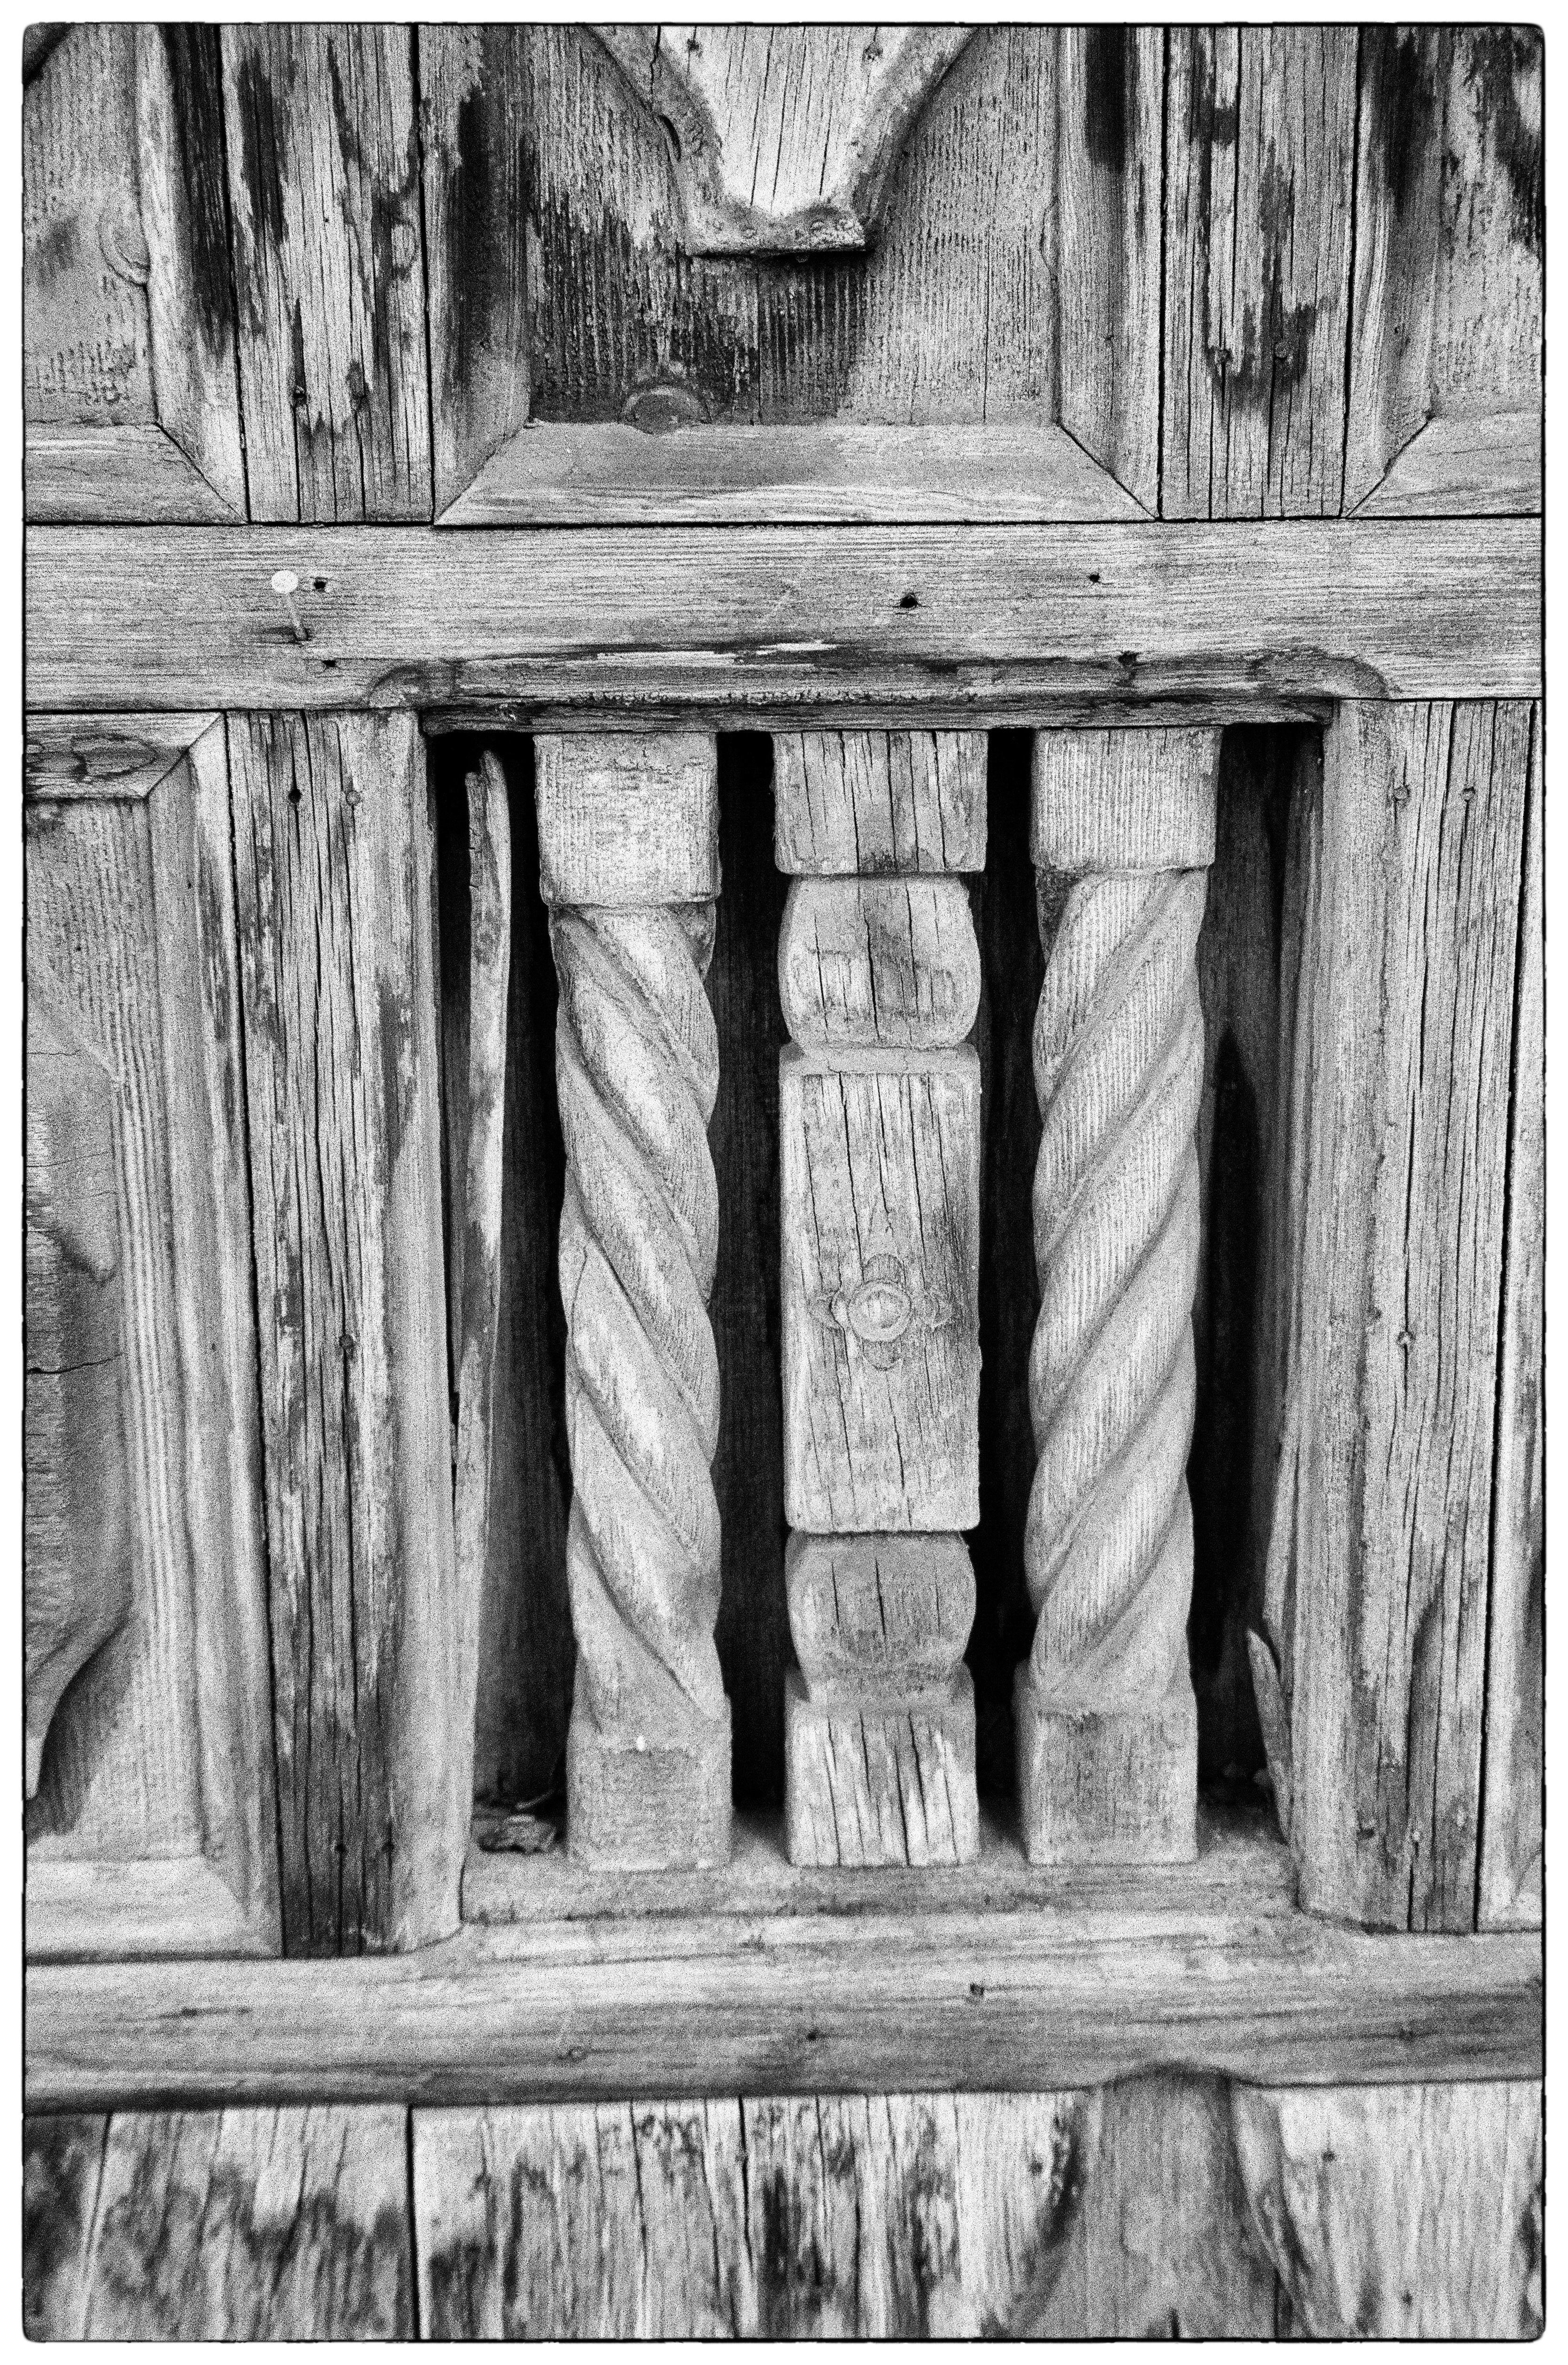 Wood Door & Doors Archives - Photography by CyberShutterbug